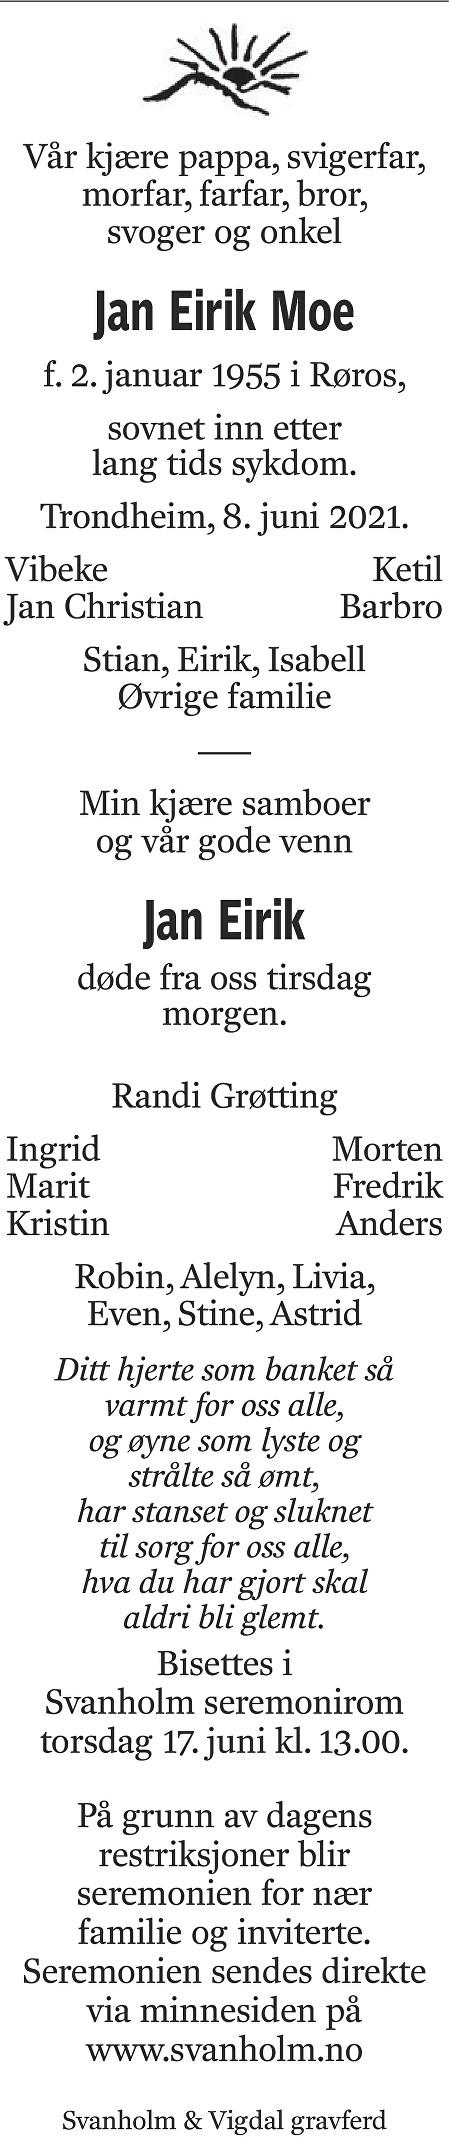 Jan Eirik Moe Dødsannonse